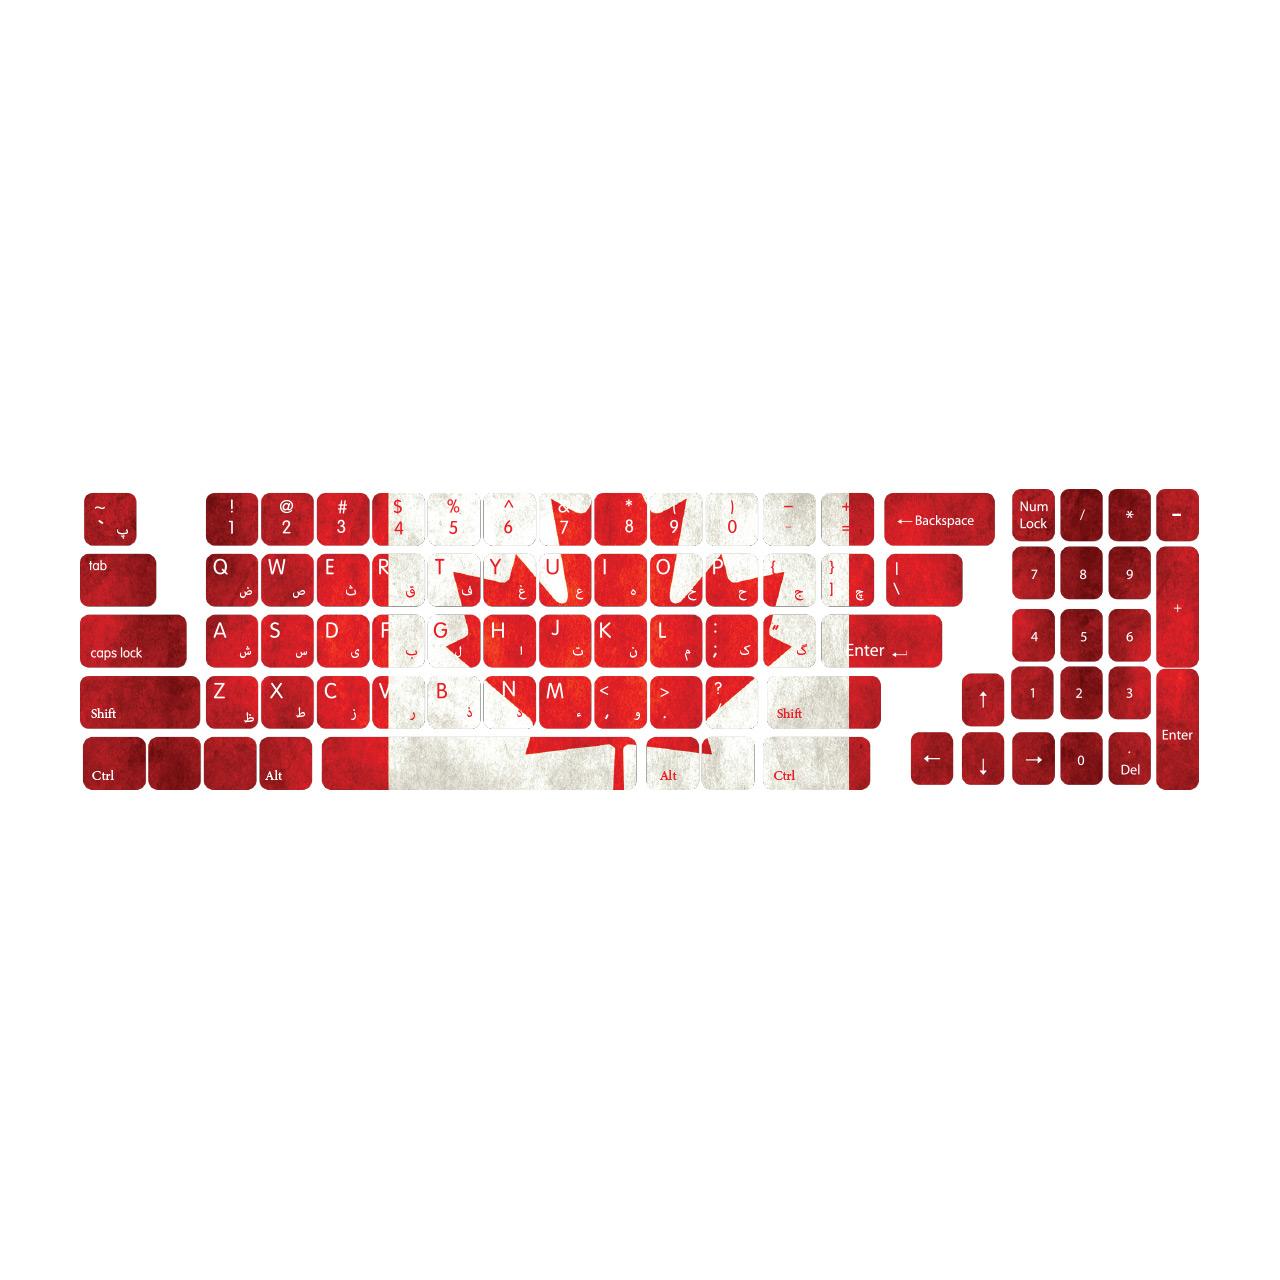 برچسب  حروف فارسی کیبورد طرح Canada  کد ۱۰۲